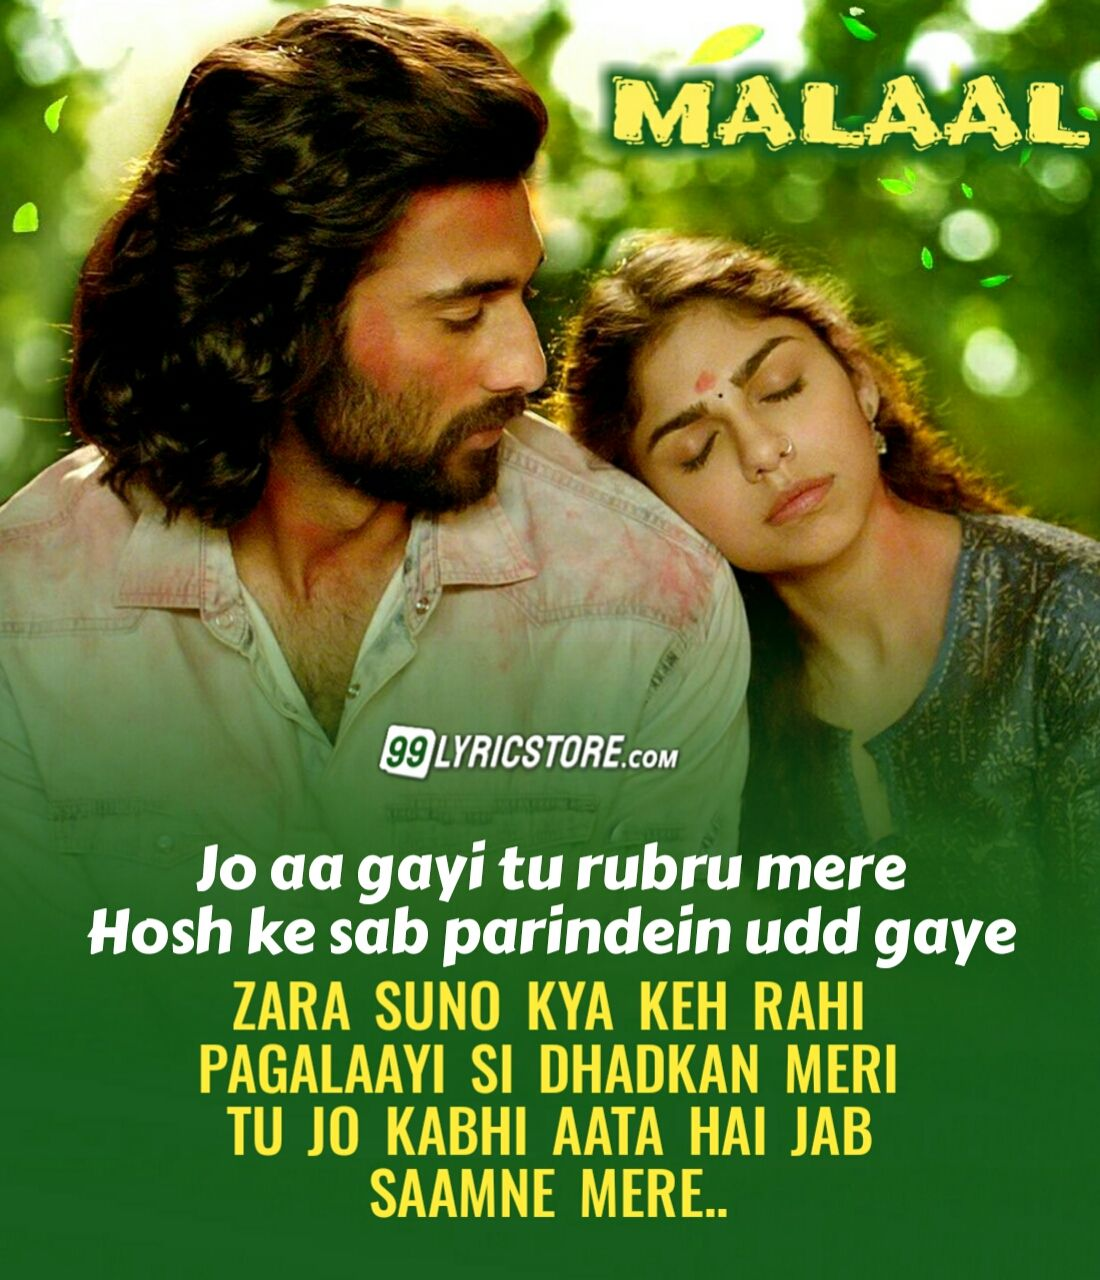 Zara Suno Hindi Song Lyrics From Movie Malaal